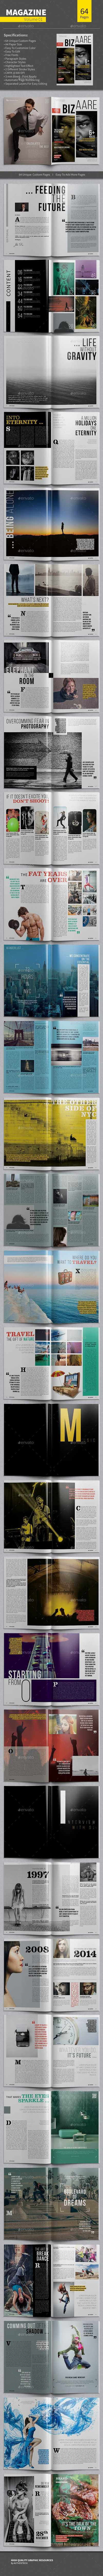 Magazine Template - Volume 01 - Magazines Print Templates